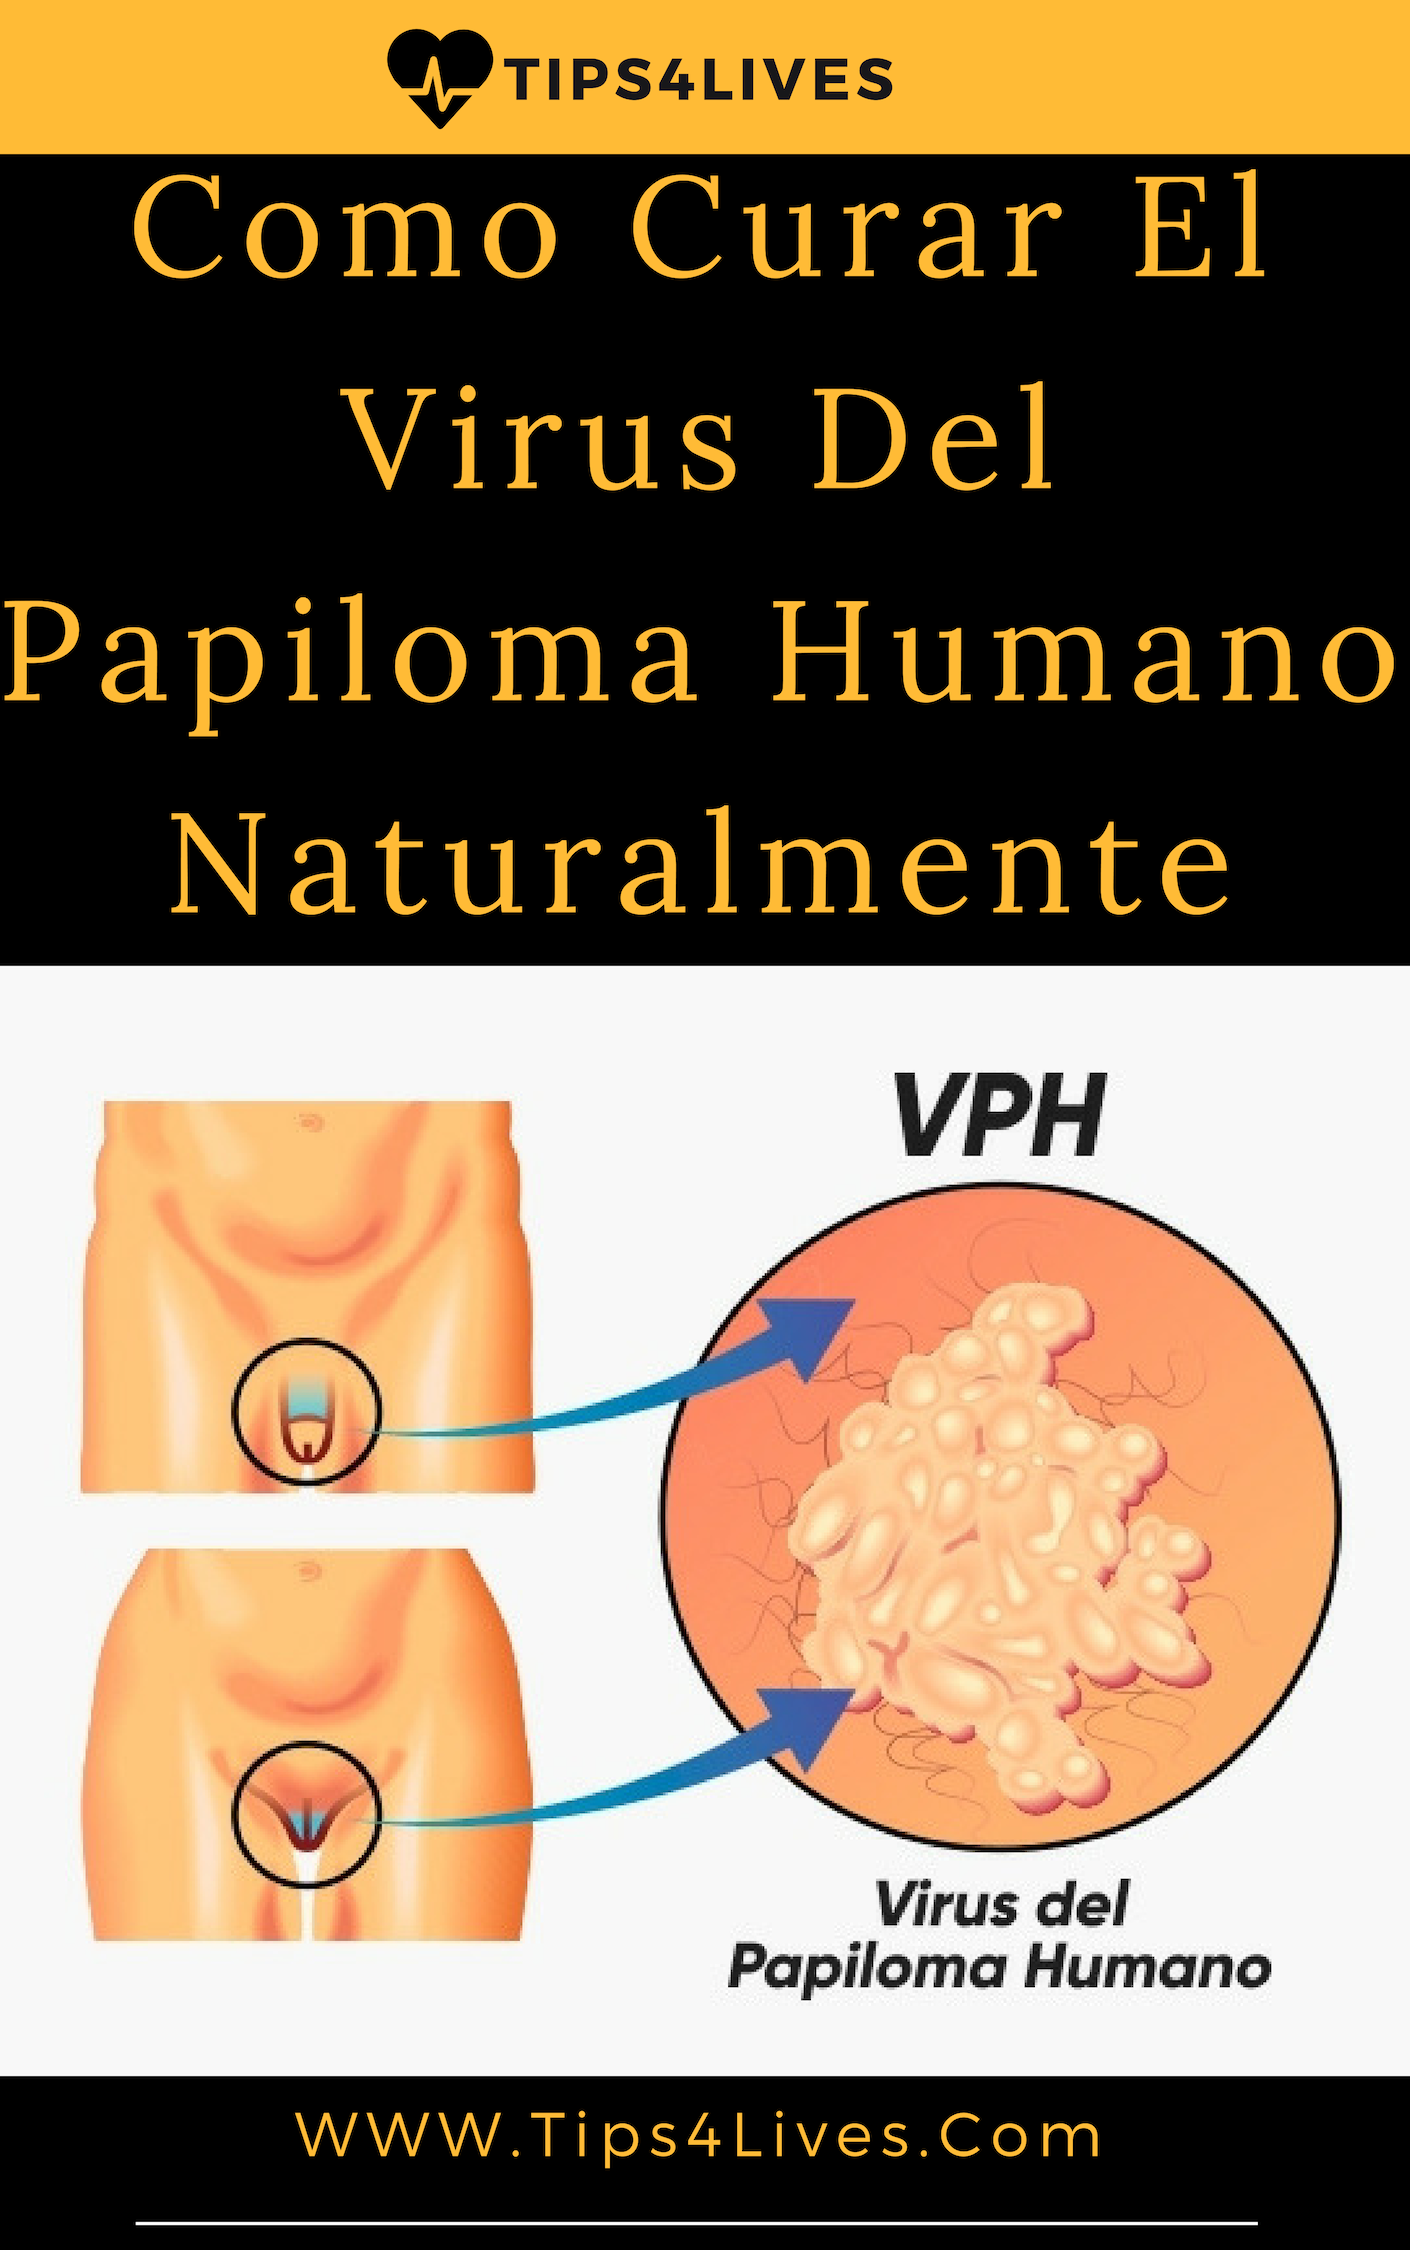 papiloma humano en hombres tratamiento verrugas hpv cervical cancer pubmed